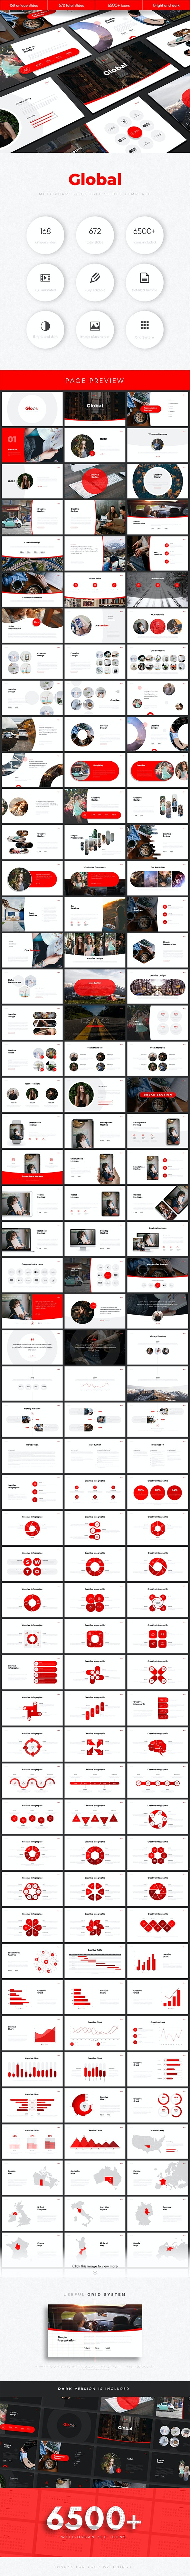 Global Multipurpose Google Slides Template - Google Slides Presentation Templates